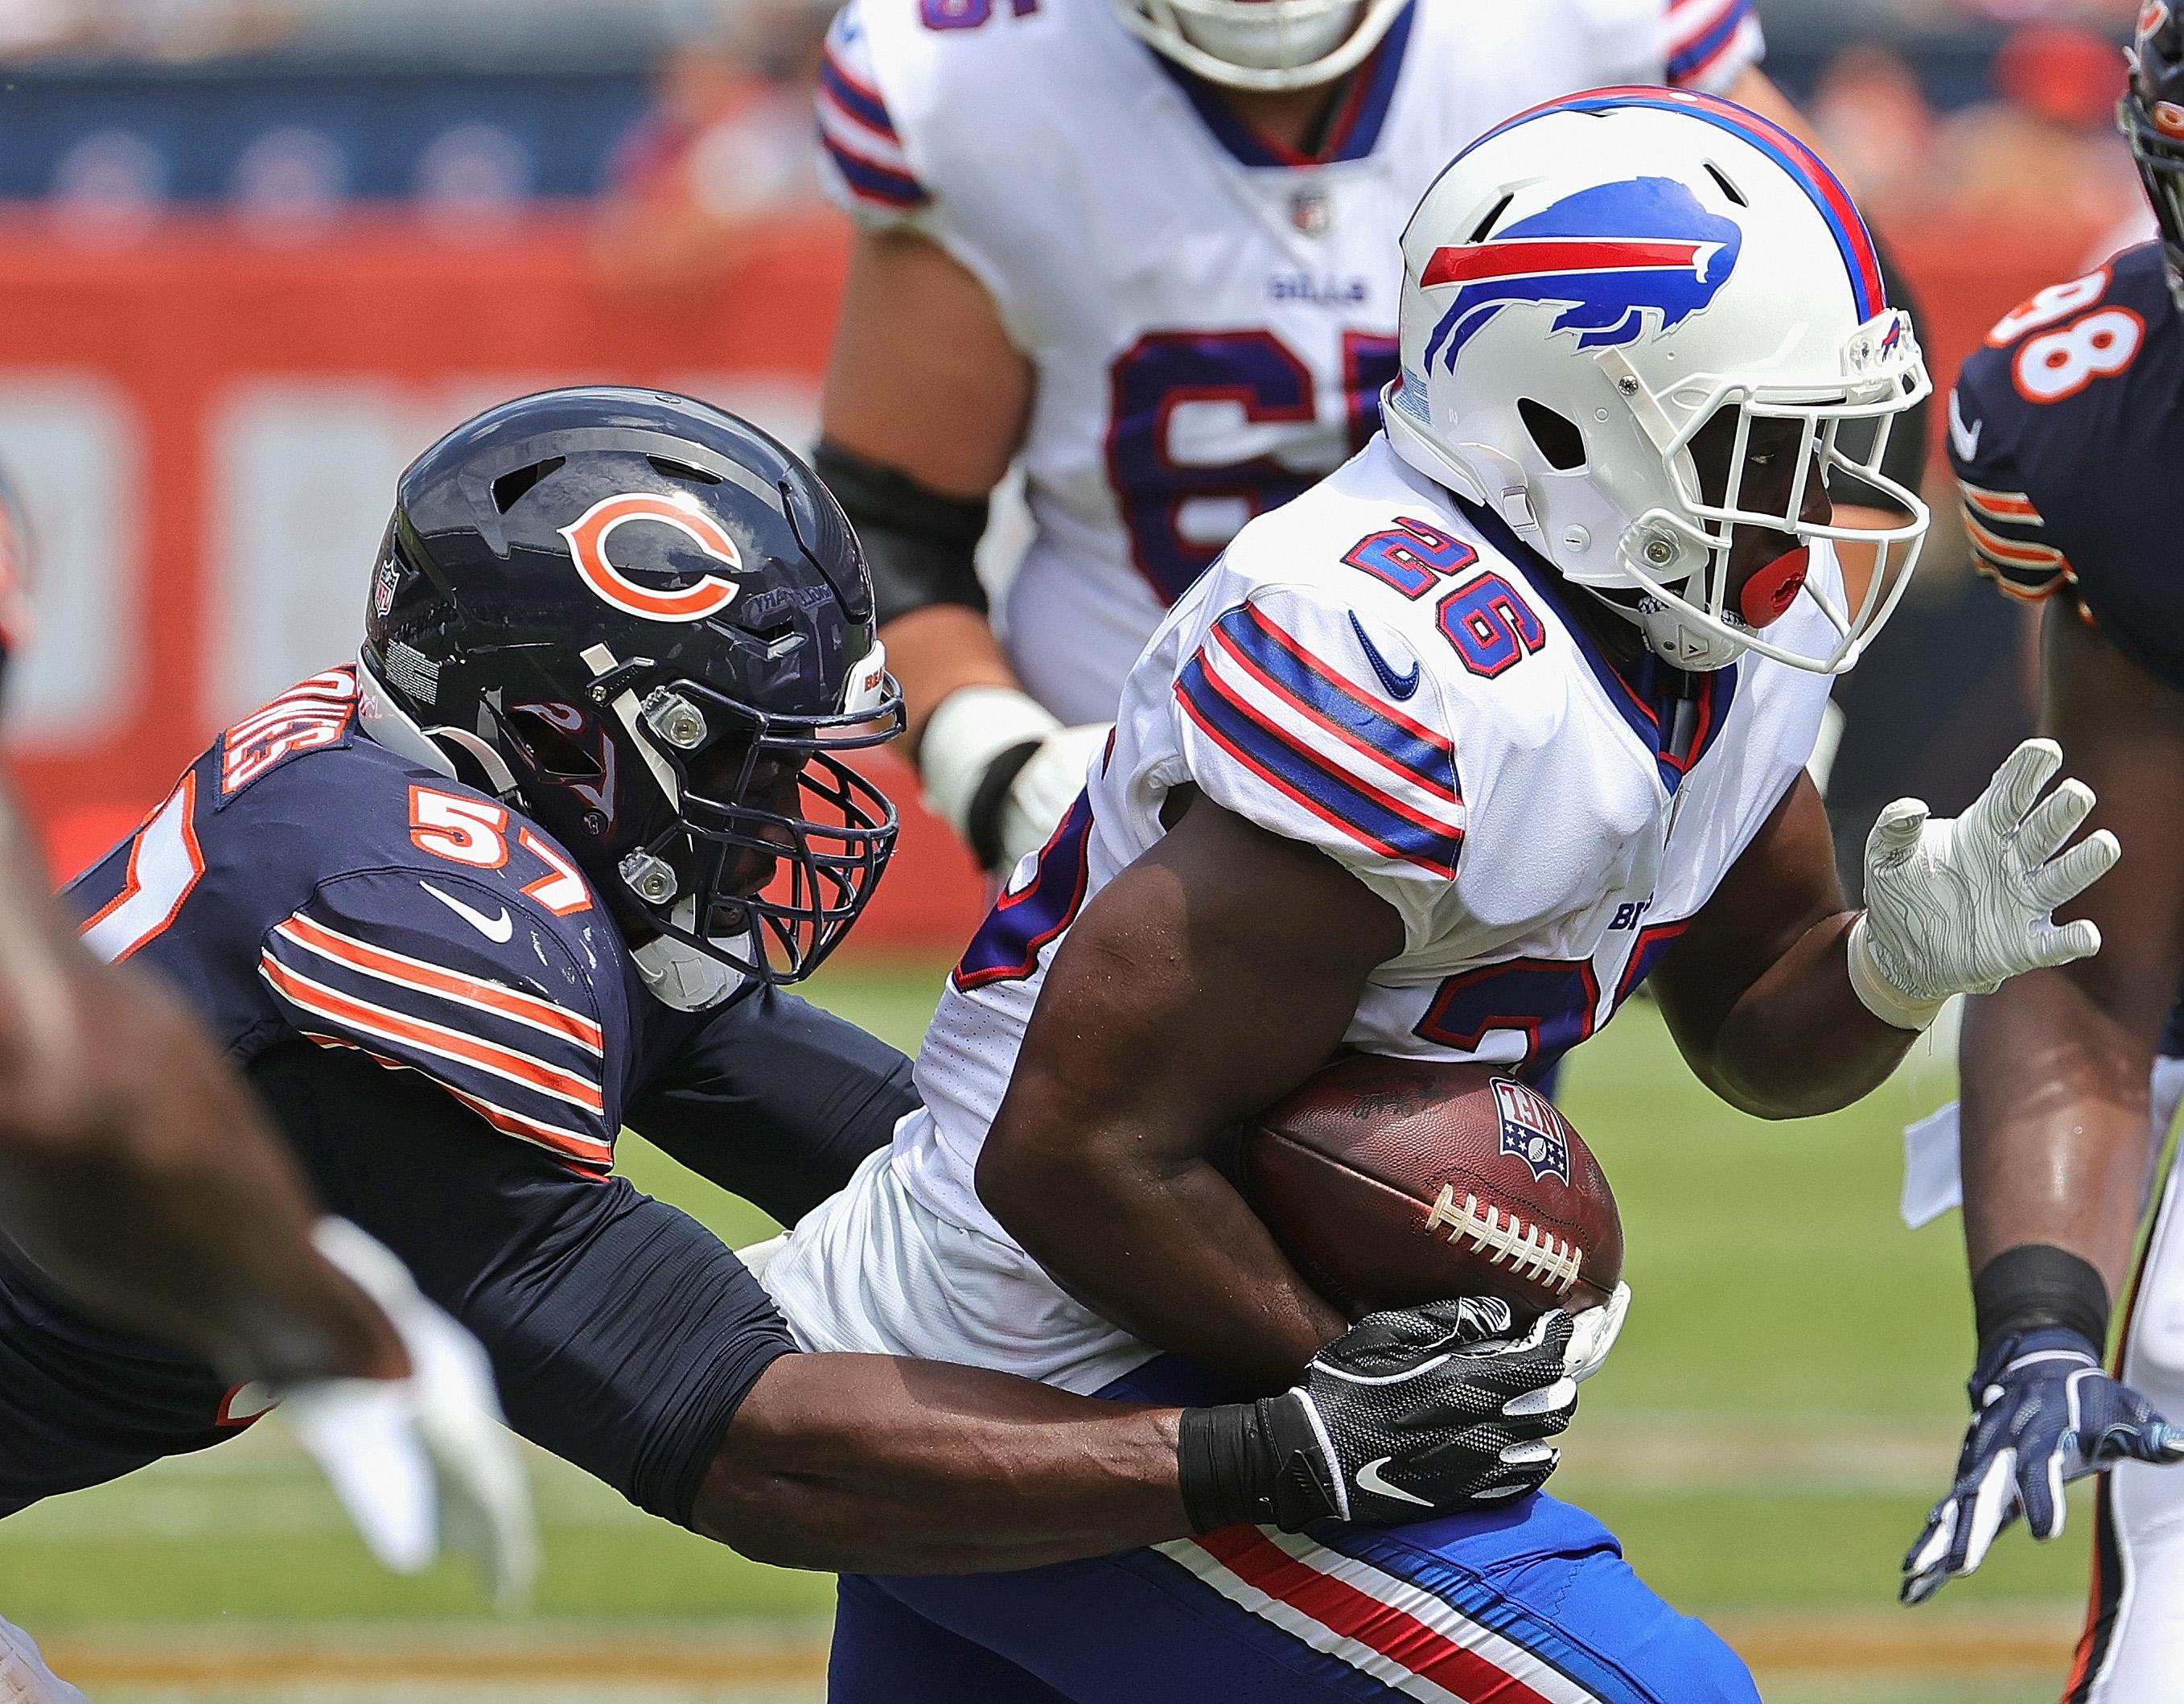 Bills running back Devin Singletary tries to break away from Bears linebacker Christian Jones on Saturday at Soldier Field.